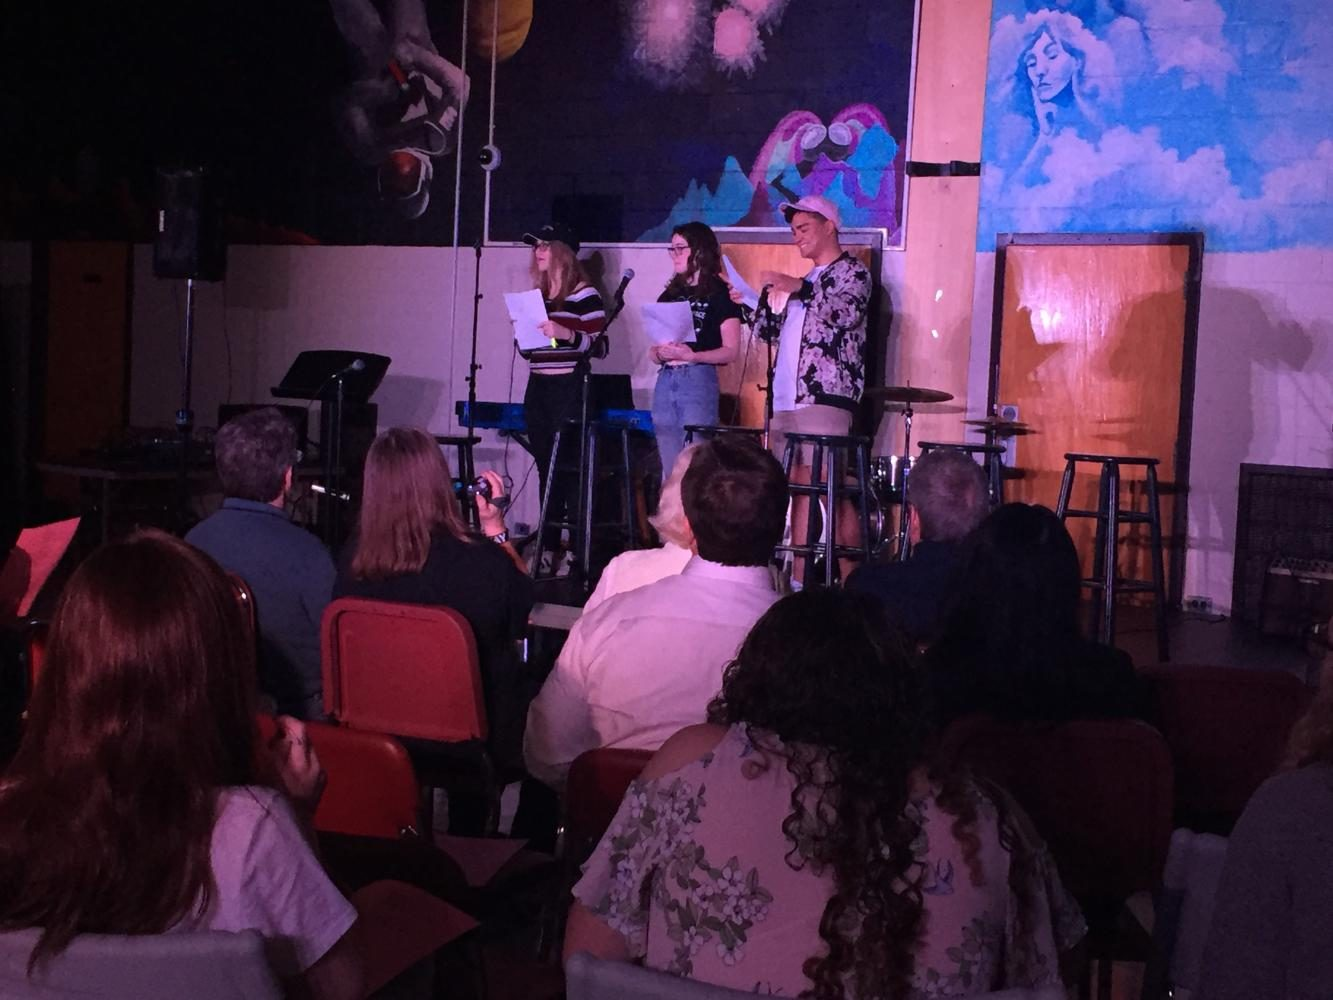 Megan+Stoddard%2C+Cami+Kaselow+and+Matt+Lacognata+host+Coffeehouse+42.